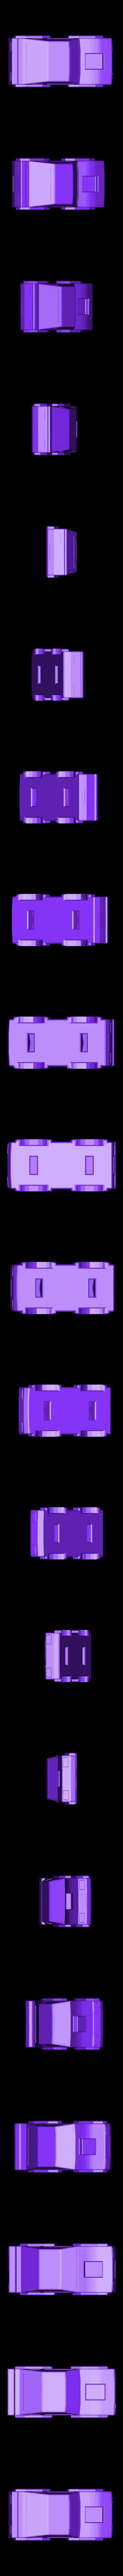 SmallToys-BodyCar2_Racing.stl Download STL file SmallToys - Cars pack • 3D print design, Wabby